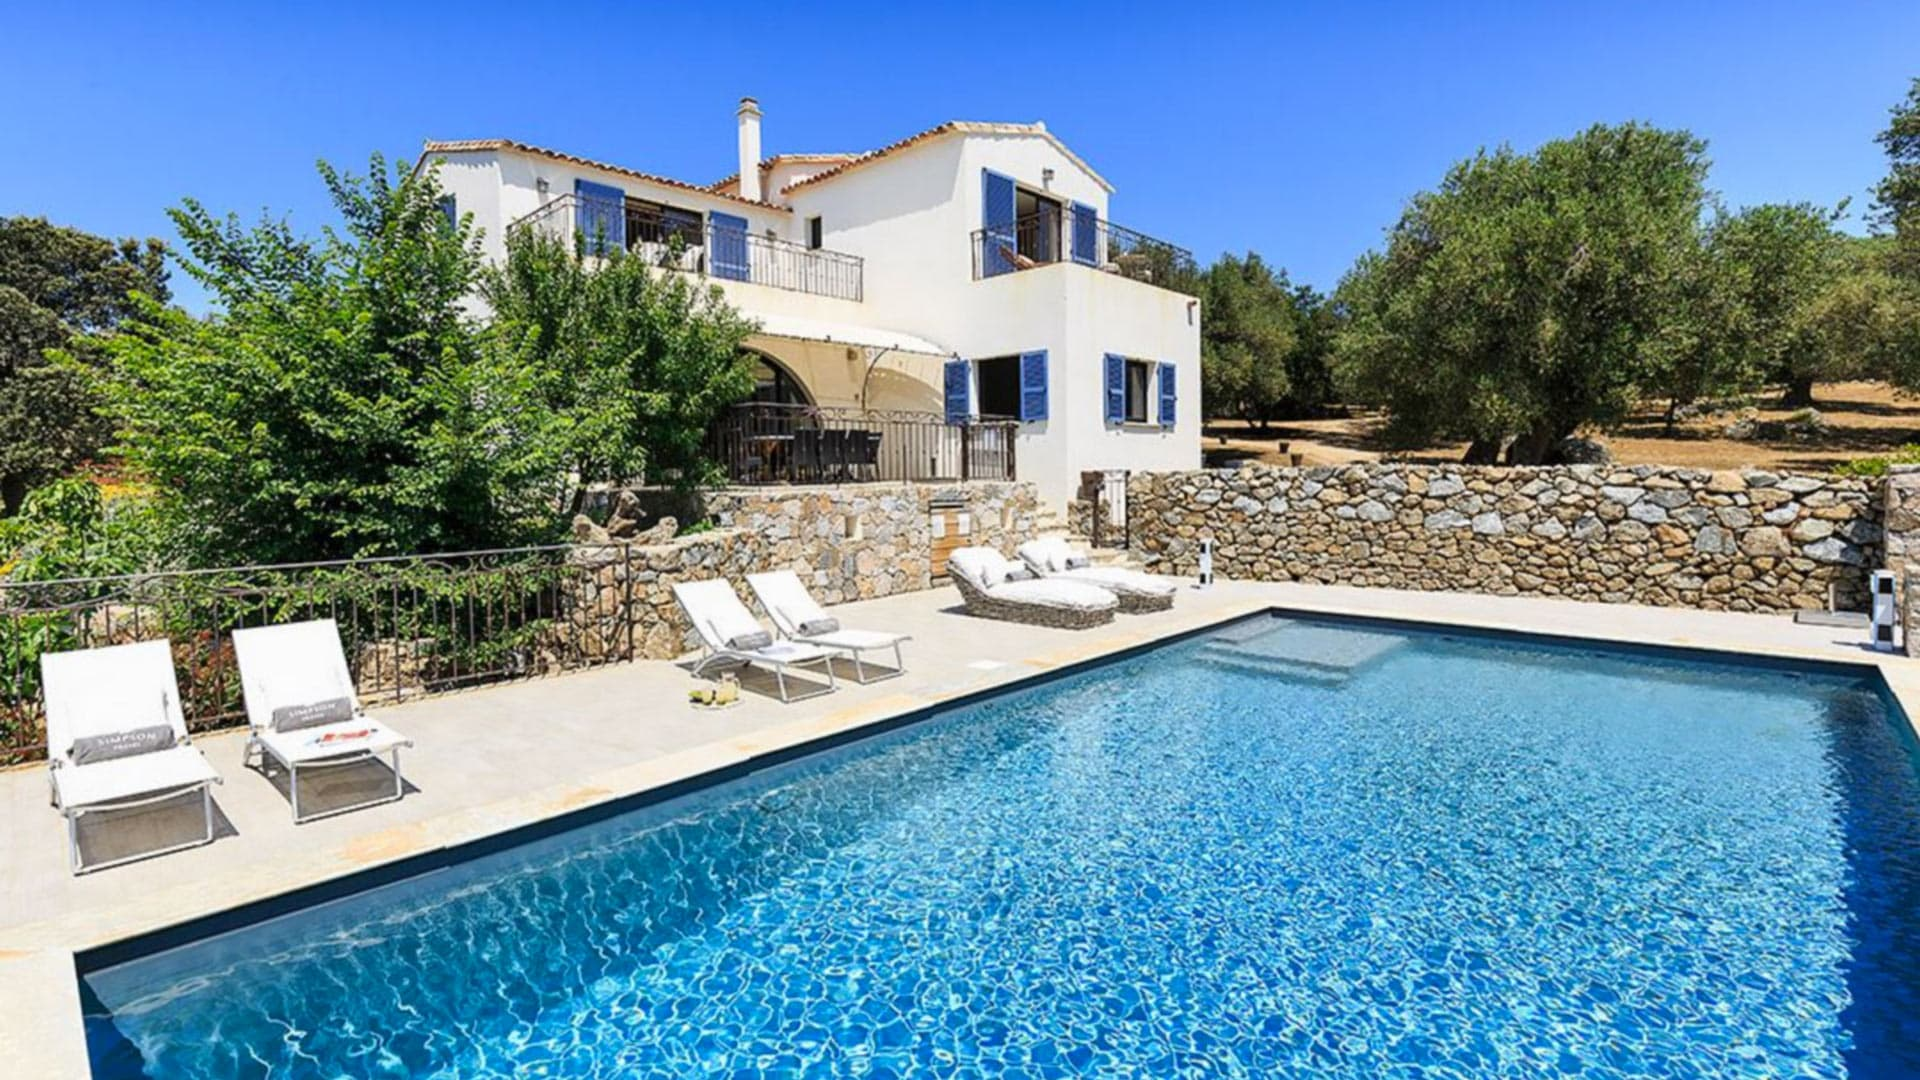 Villa Villa Oliveraie, Rental in Corsica